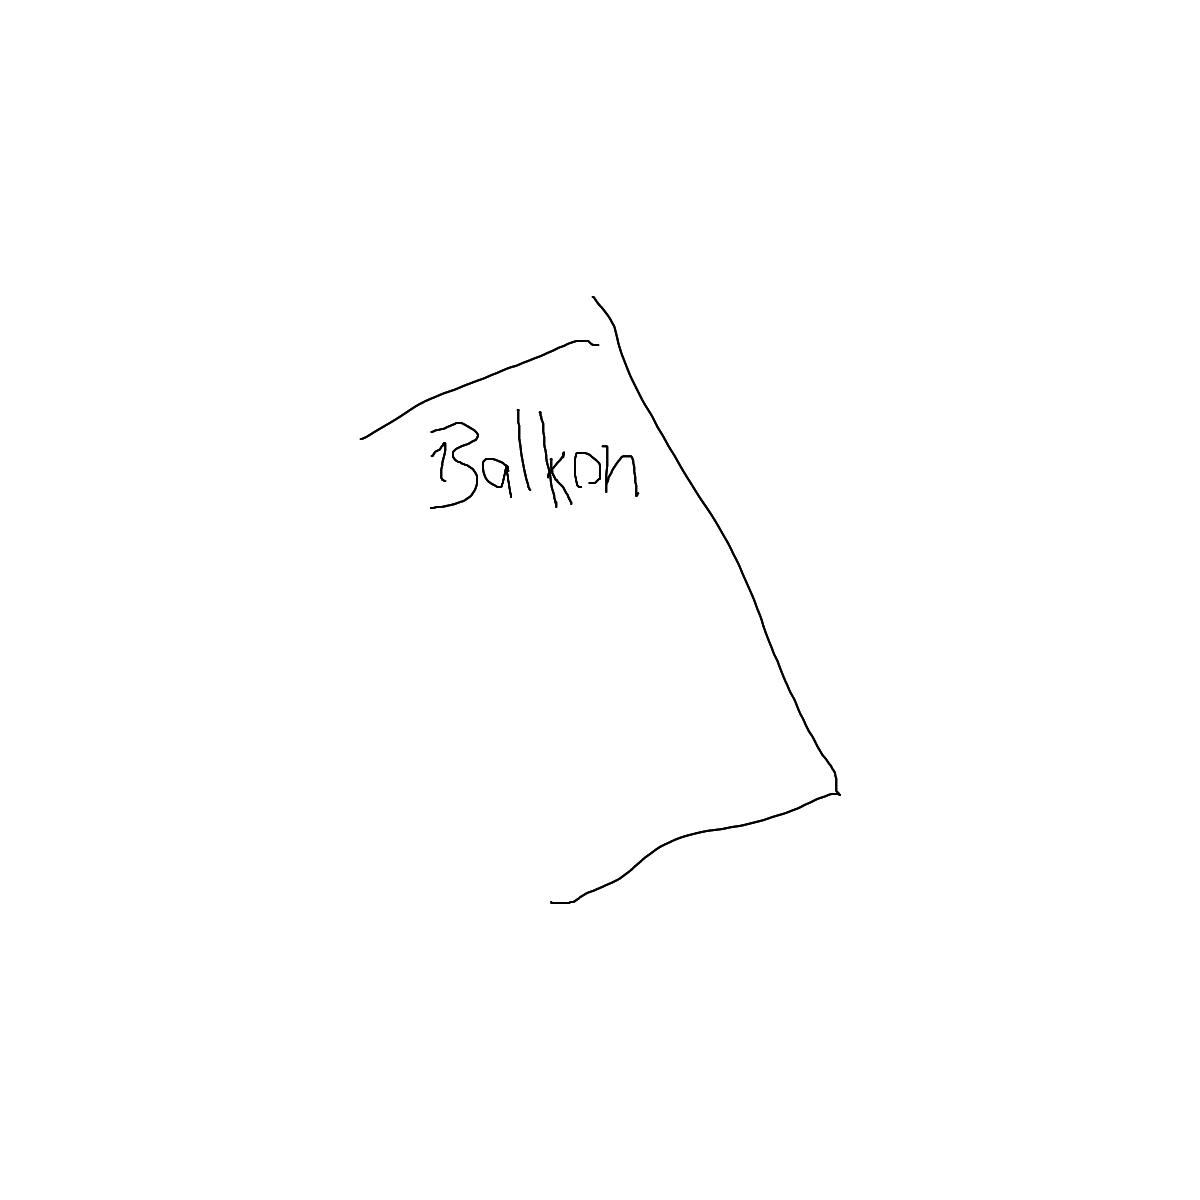 BAAAM drawing#17478 lat:50.1000175476074200lng: 8.7721261978149410